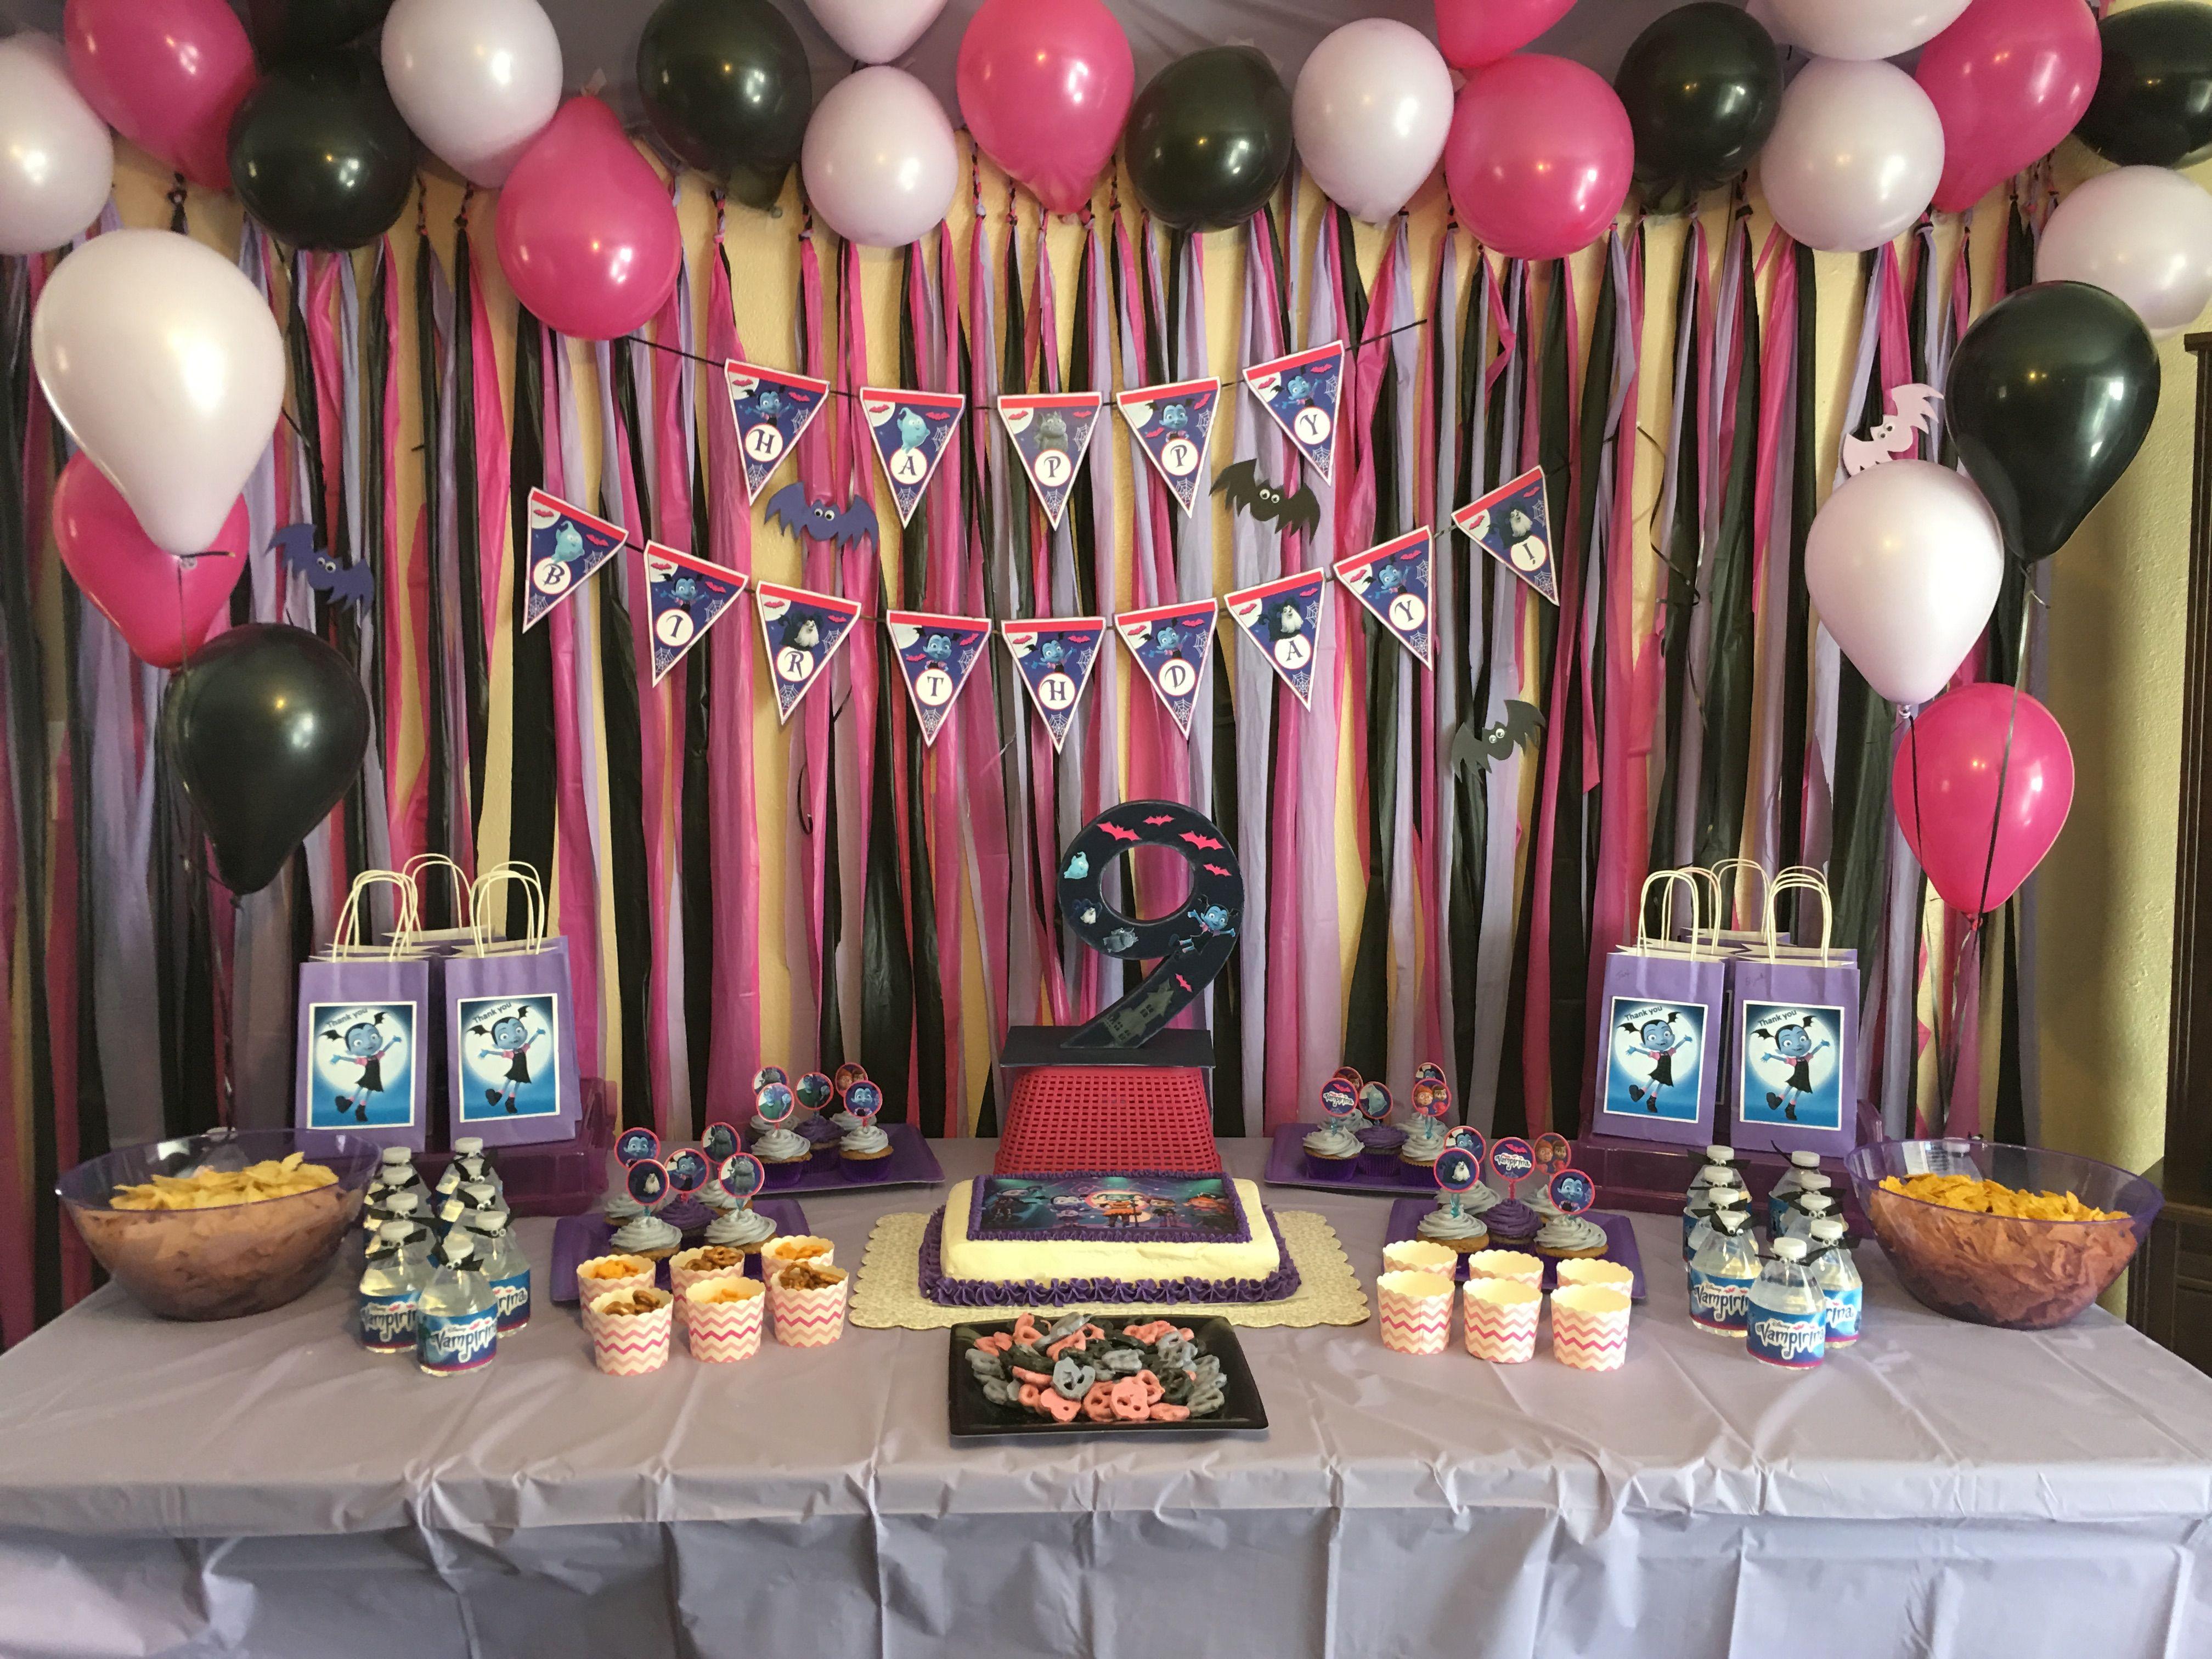 Pin by stefani on ideas para fiesta de vampirina in 2019 - Decoracion de fiestas de cumpleanos infantiles ...